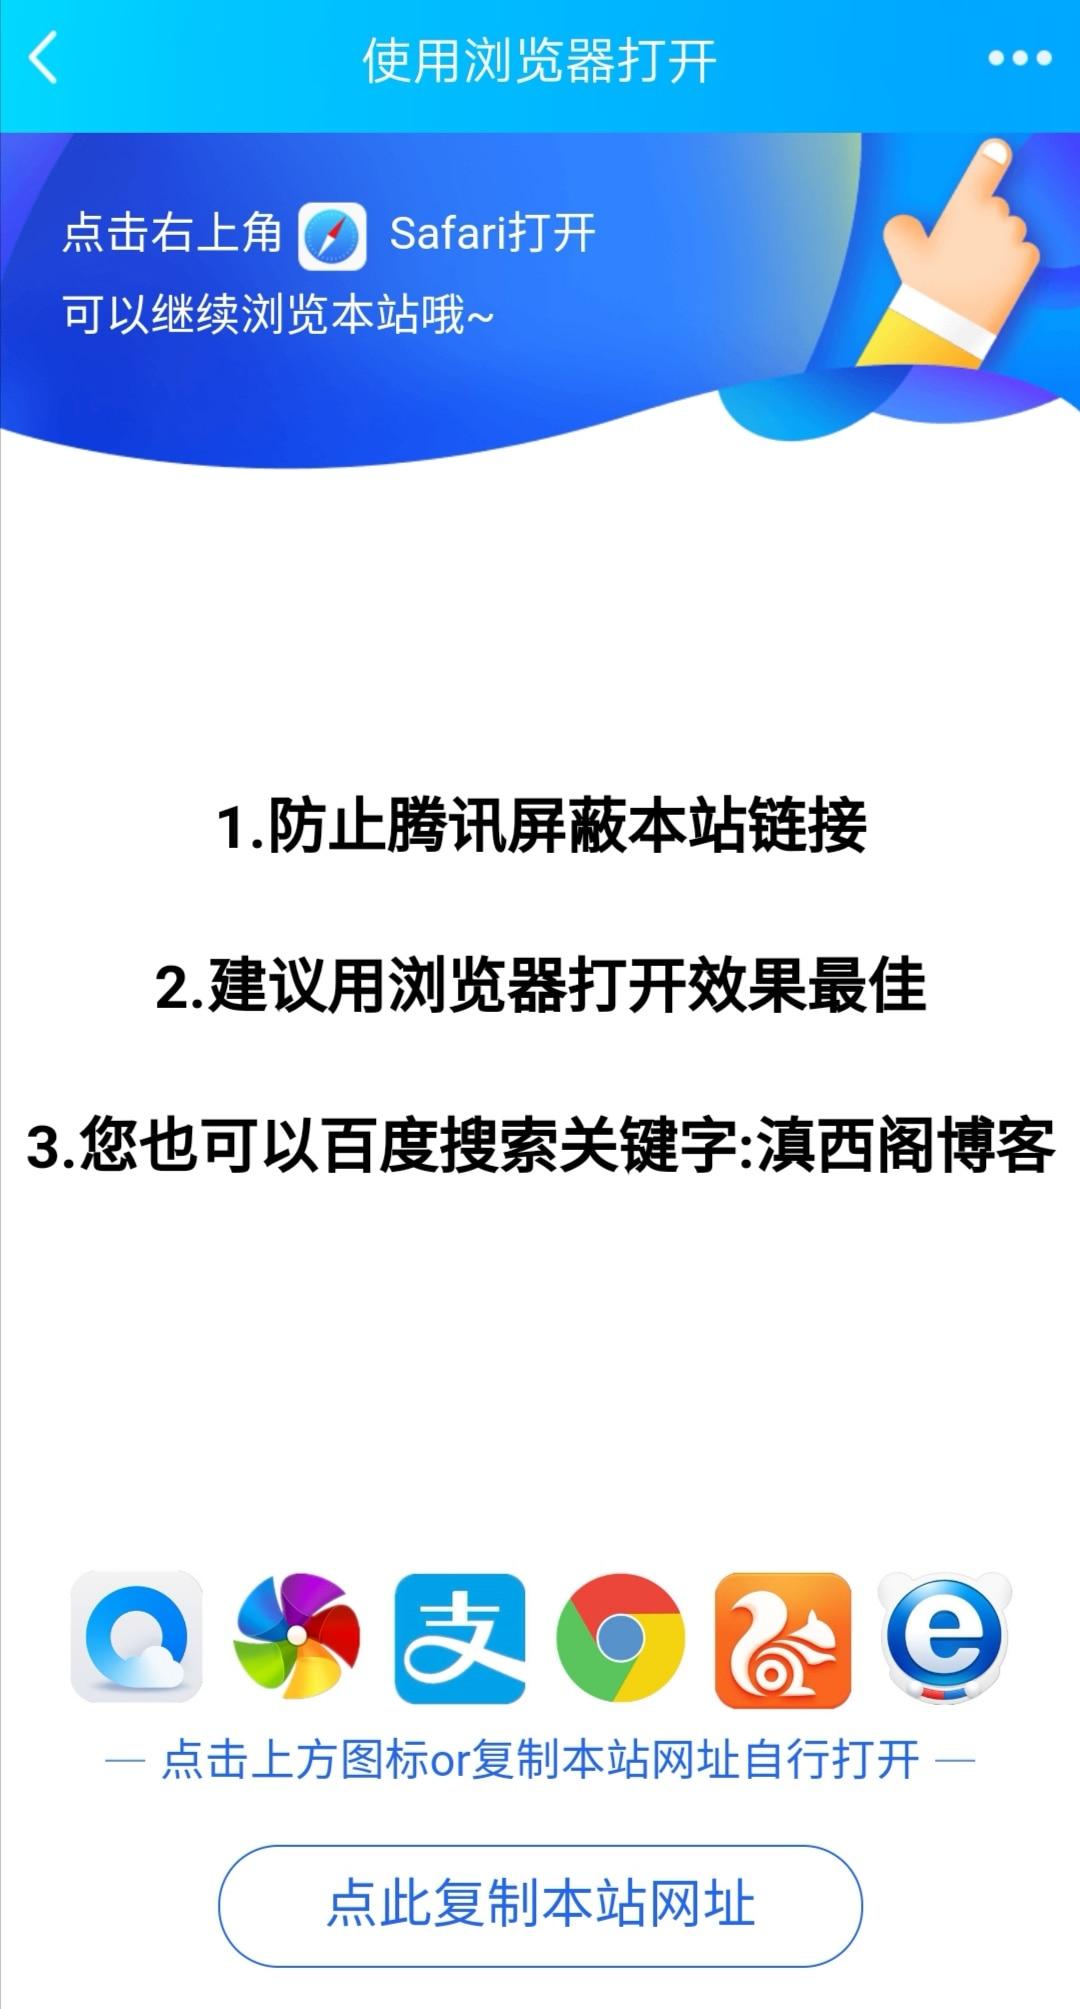 php简单通用微信QQ防红跳转浏览器源码-资源联盟分享网